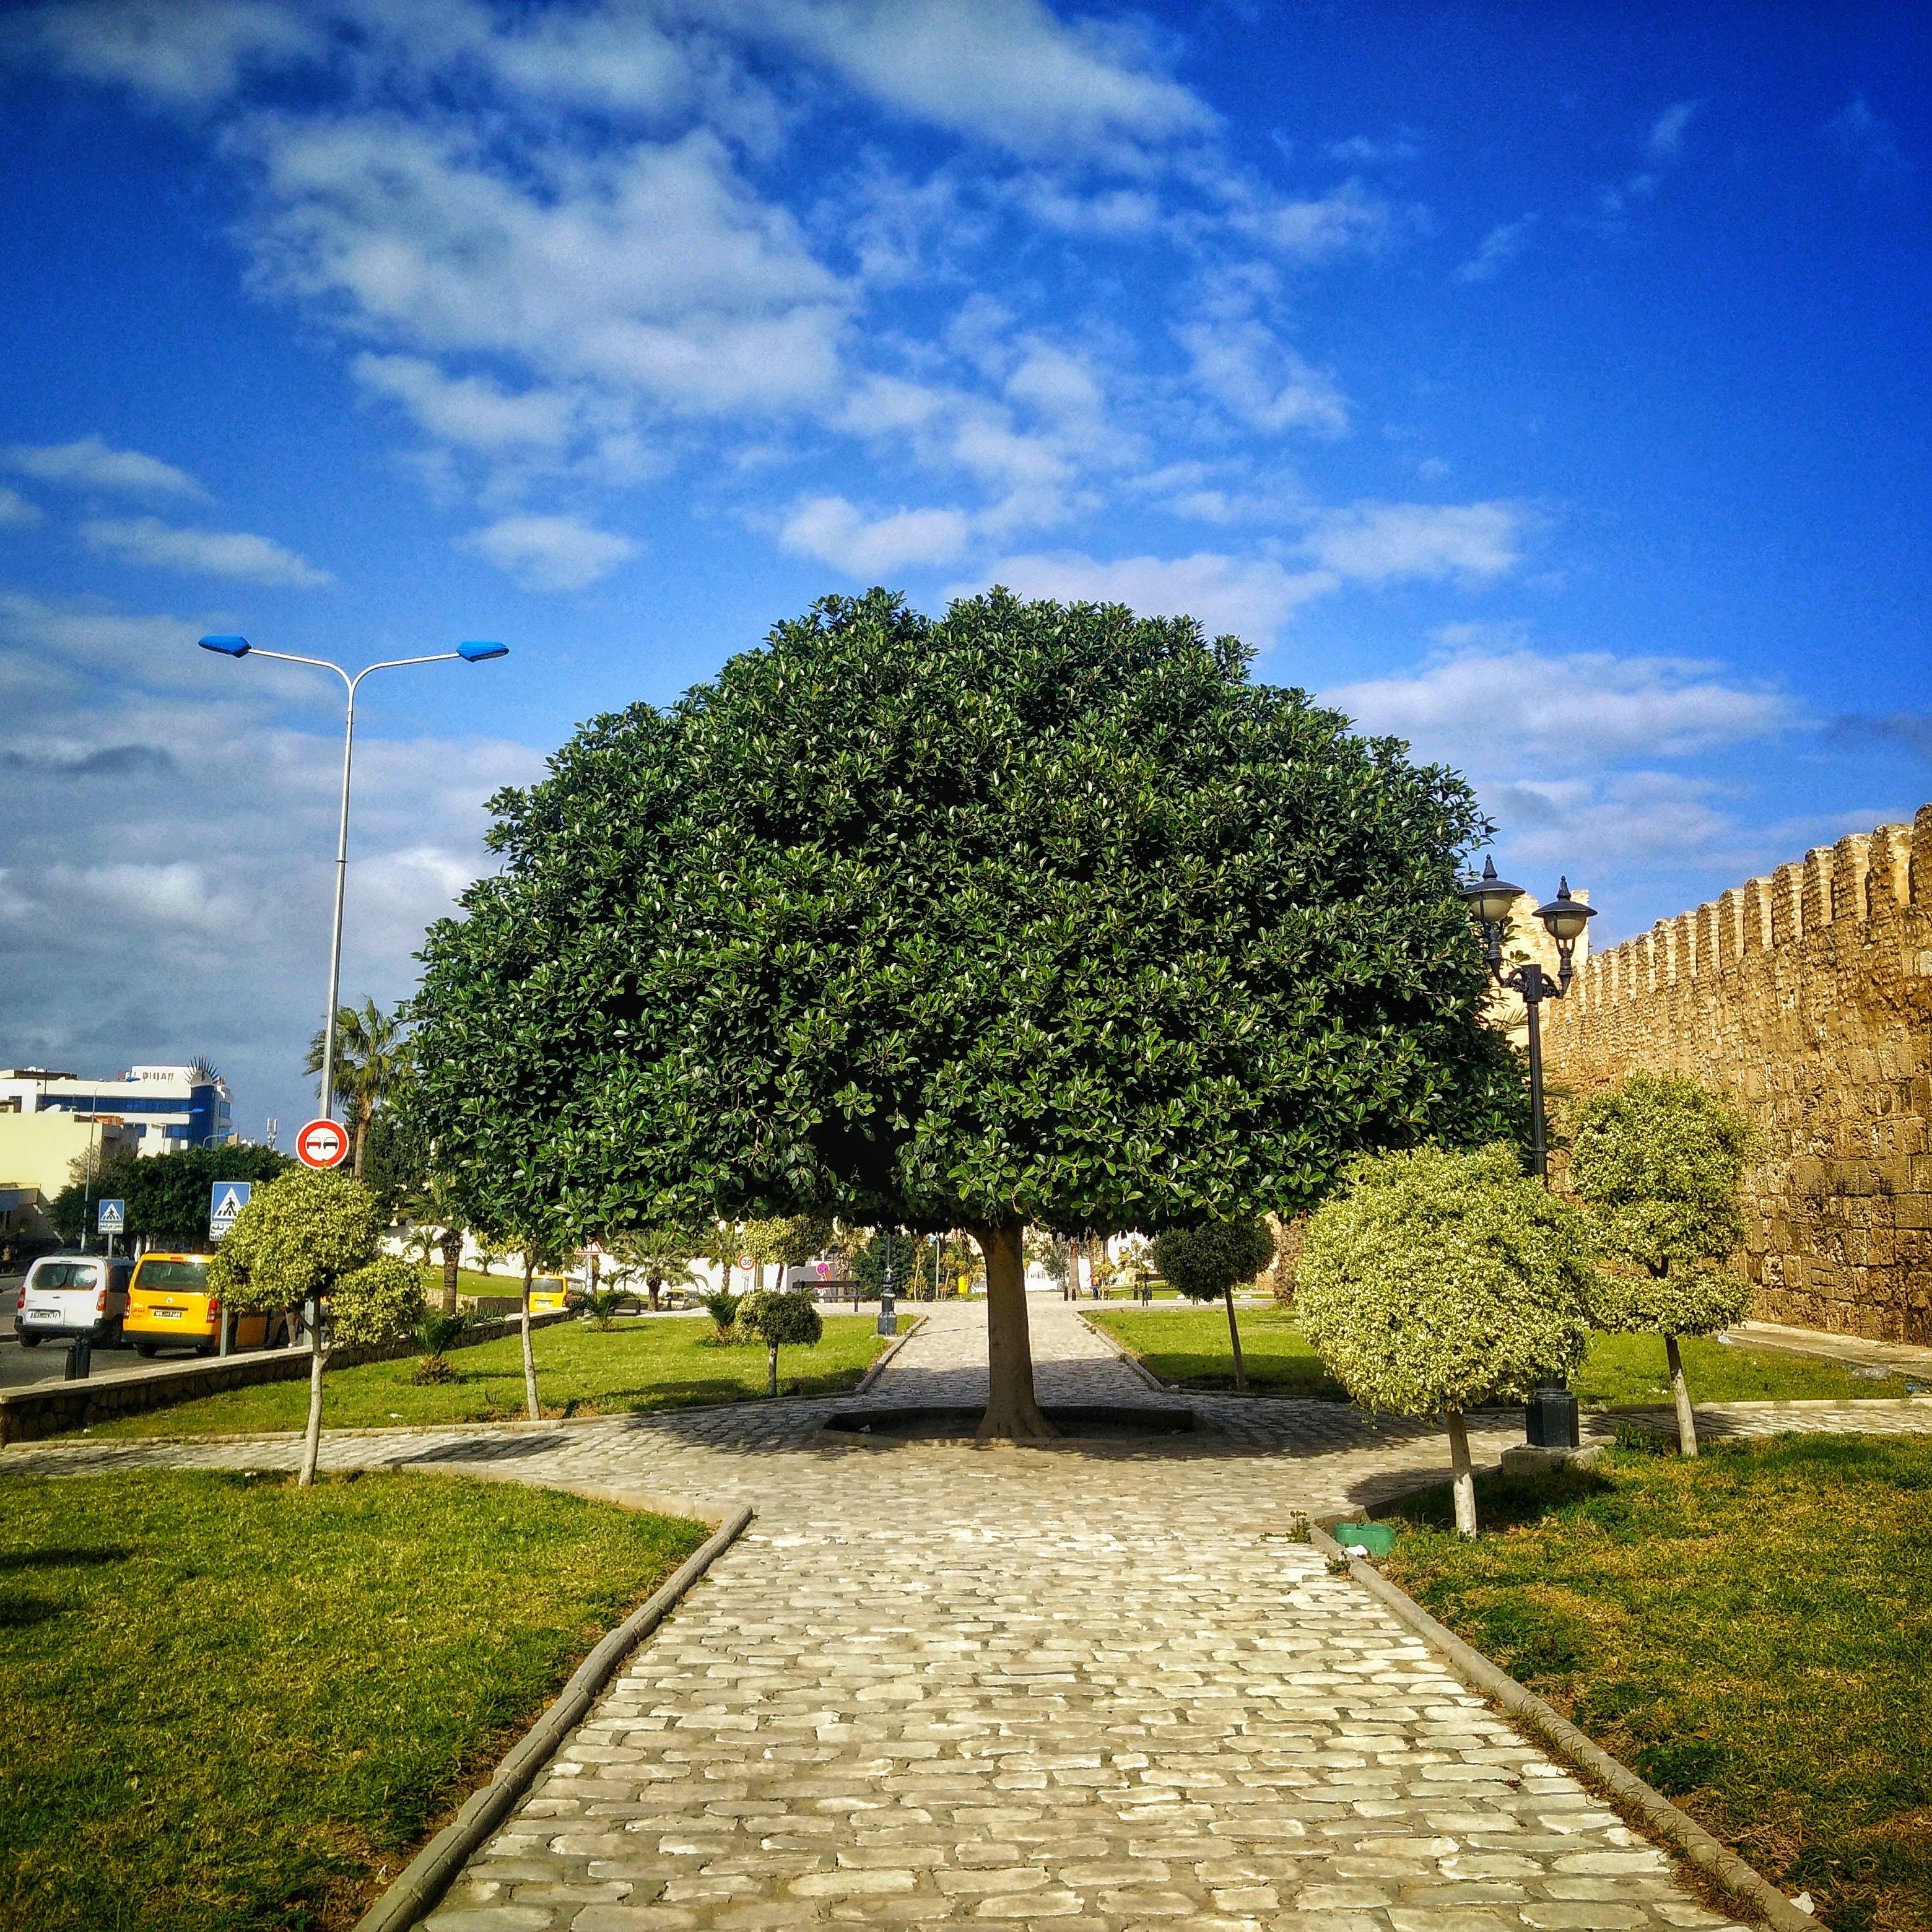 Free stock photo of #mobilechallenge, mobilechallenge, tree